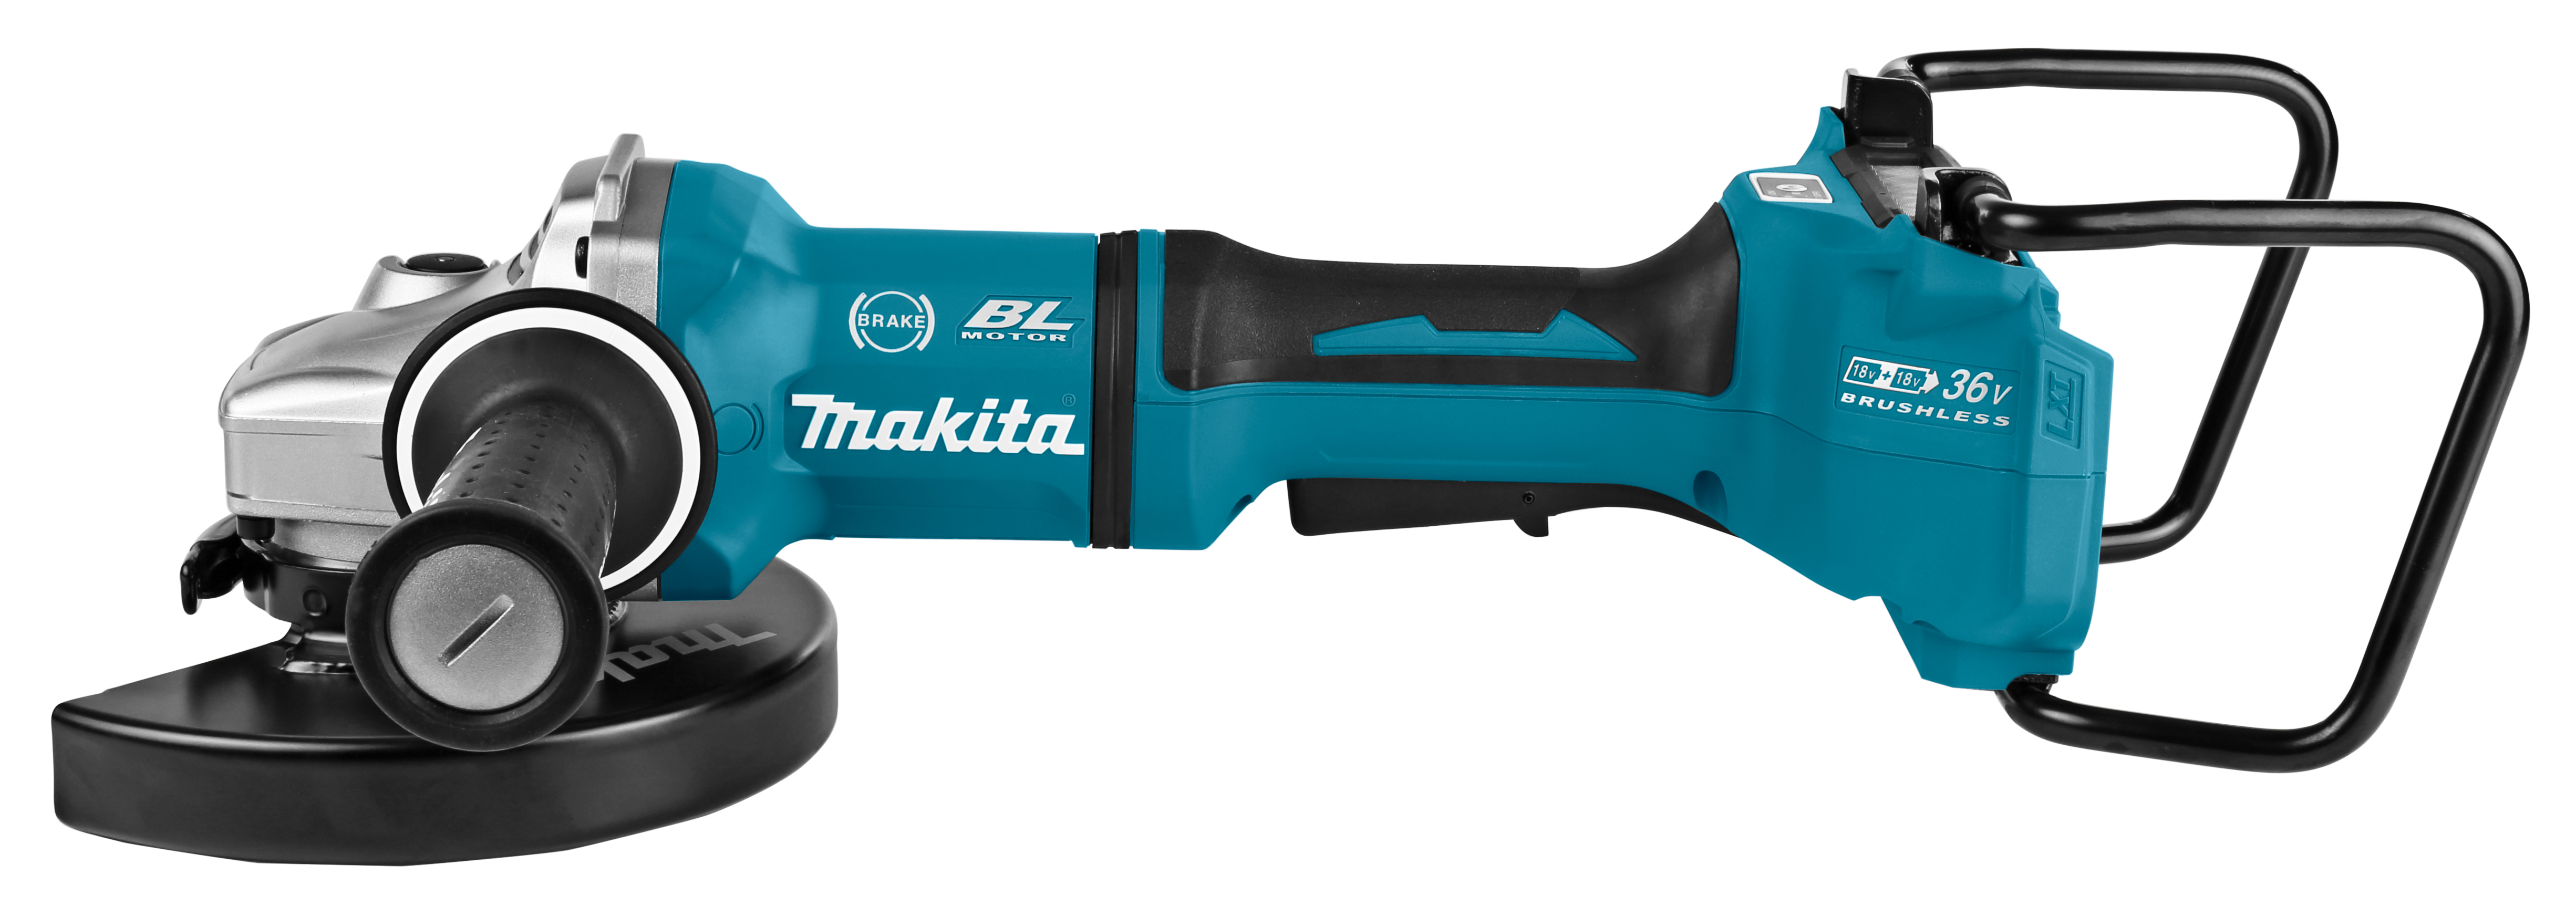 Makita DGA701- 2x18V Haakse slijper 180 mm